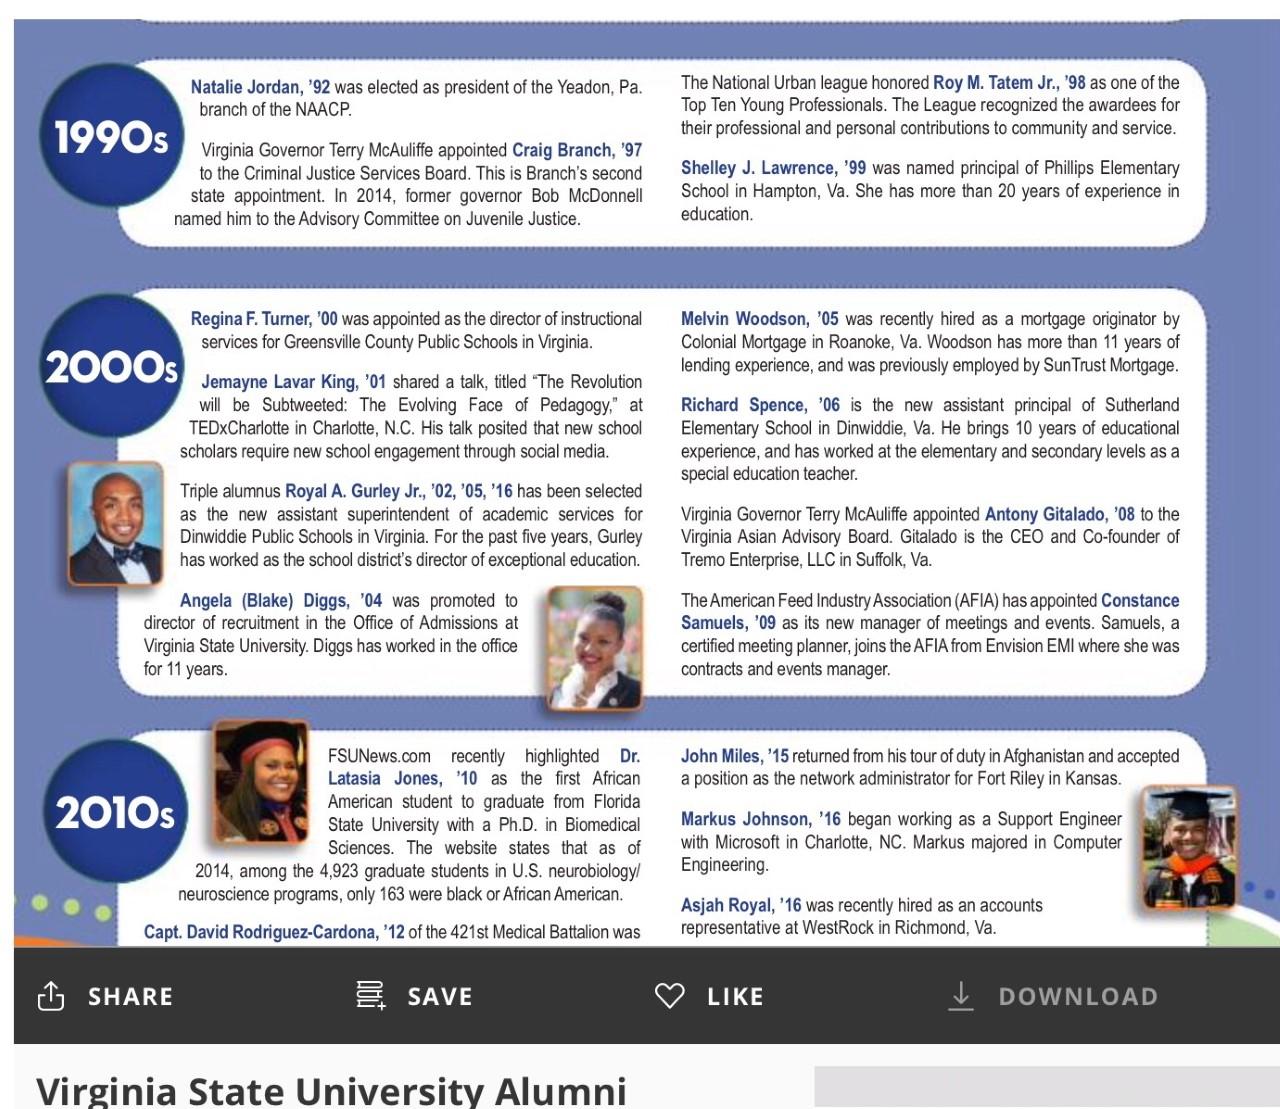 alumnimag.jpg